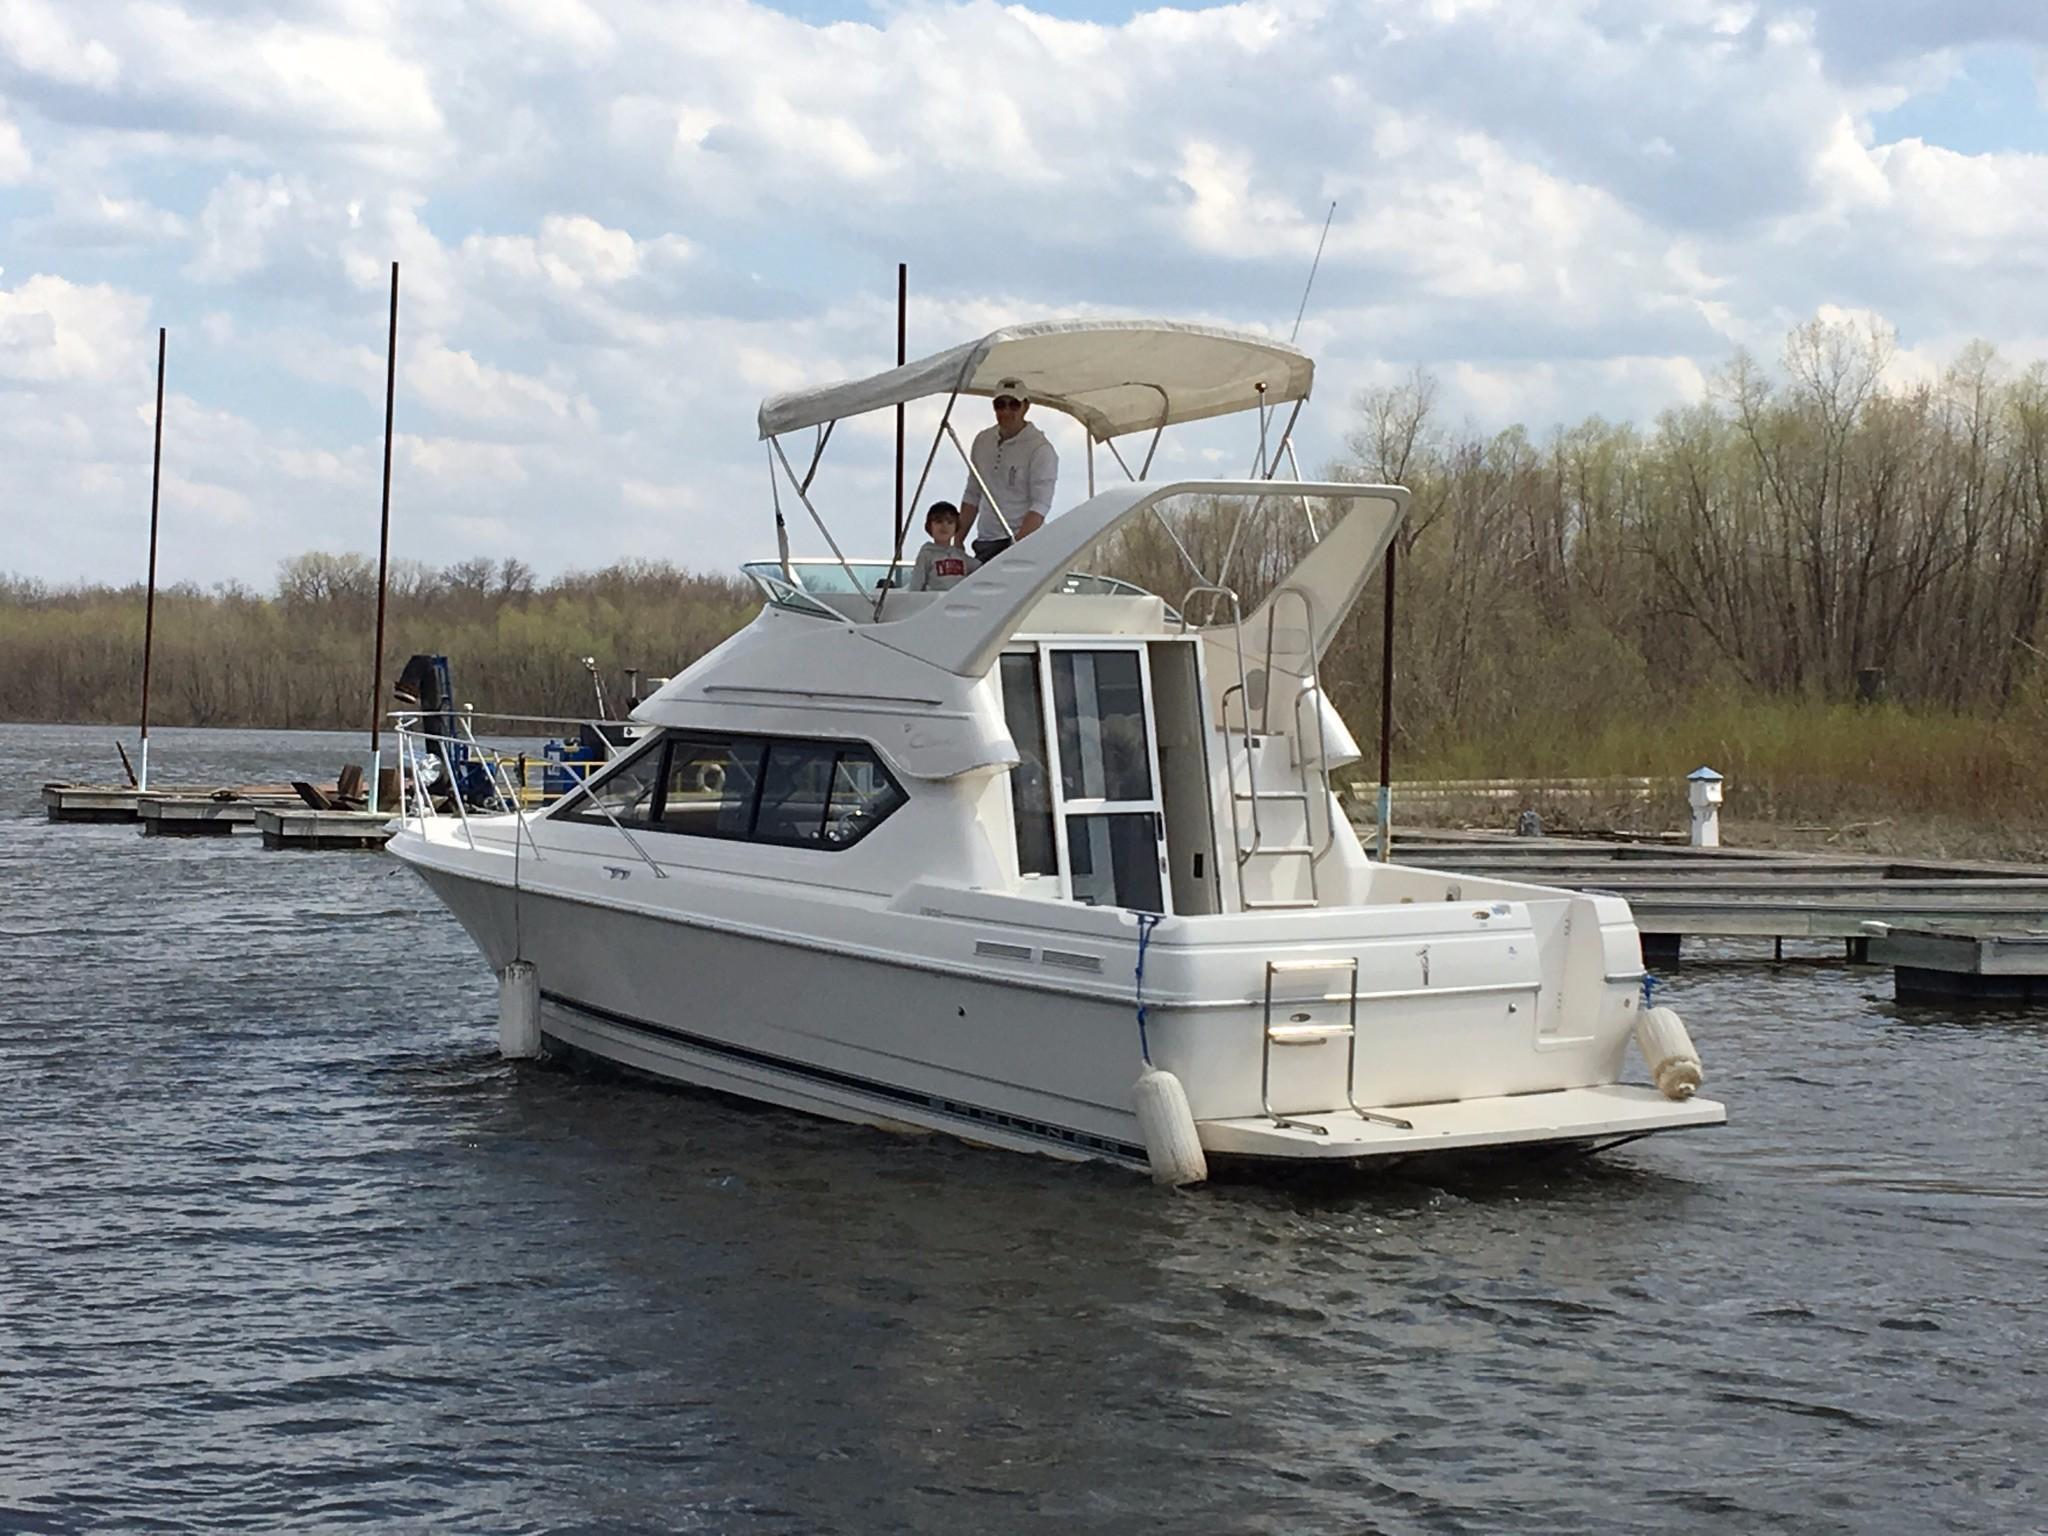 Insurance Brokers Of Mn >> 1997 Bayliner 2858 Ciera Command Bridge Power Boat For Sale - www.yachtworld.com